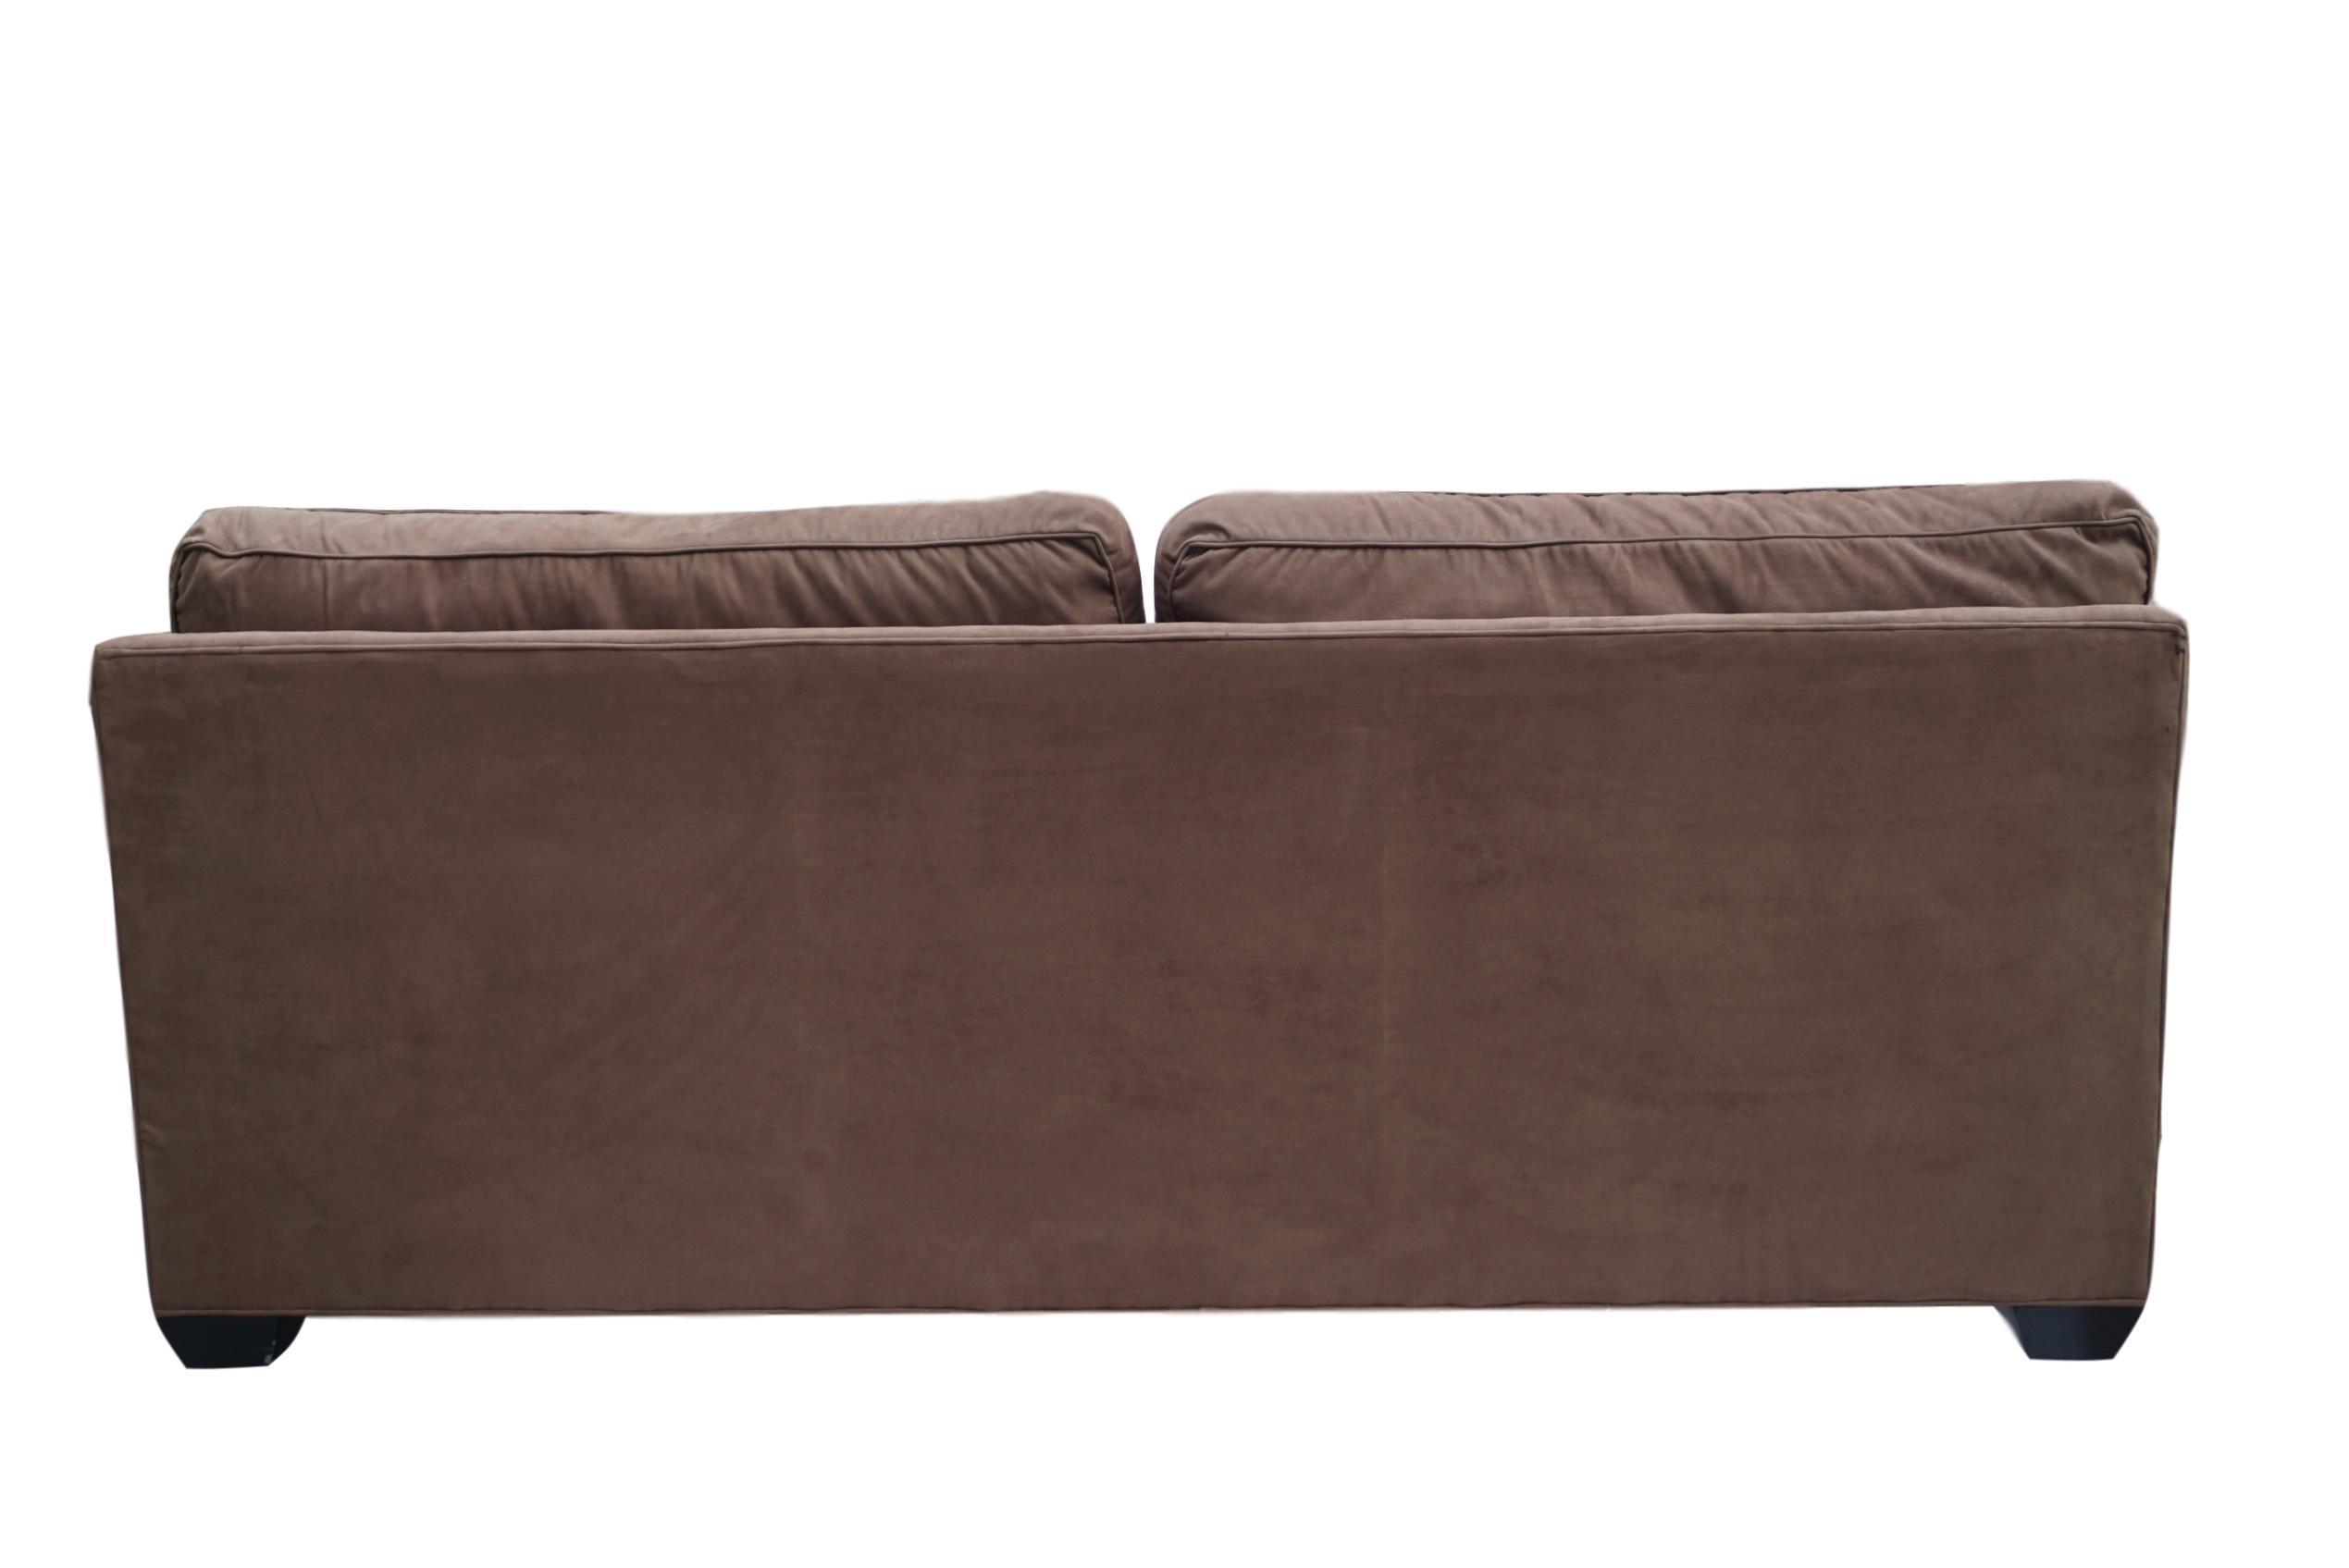 barclay butera brown microsuede sofa chairish rh chairish com Grey Microsuede Sofa Ashley Microsuede Sofa